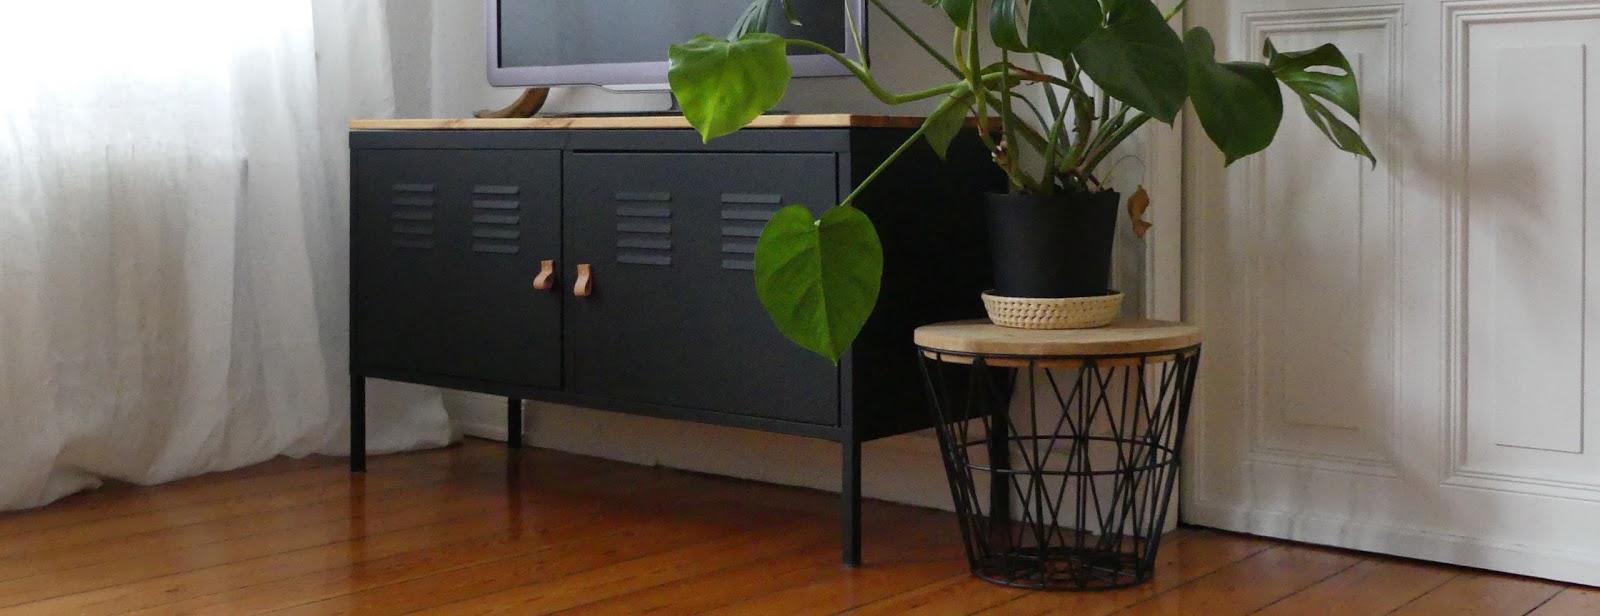 Ikea Hack Aus Klapprigem Ps Schrank Wird Edle Tv Konsole